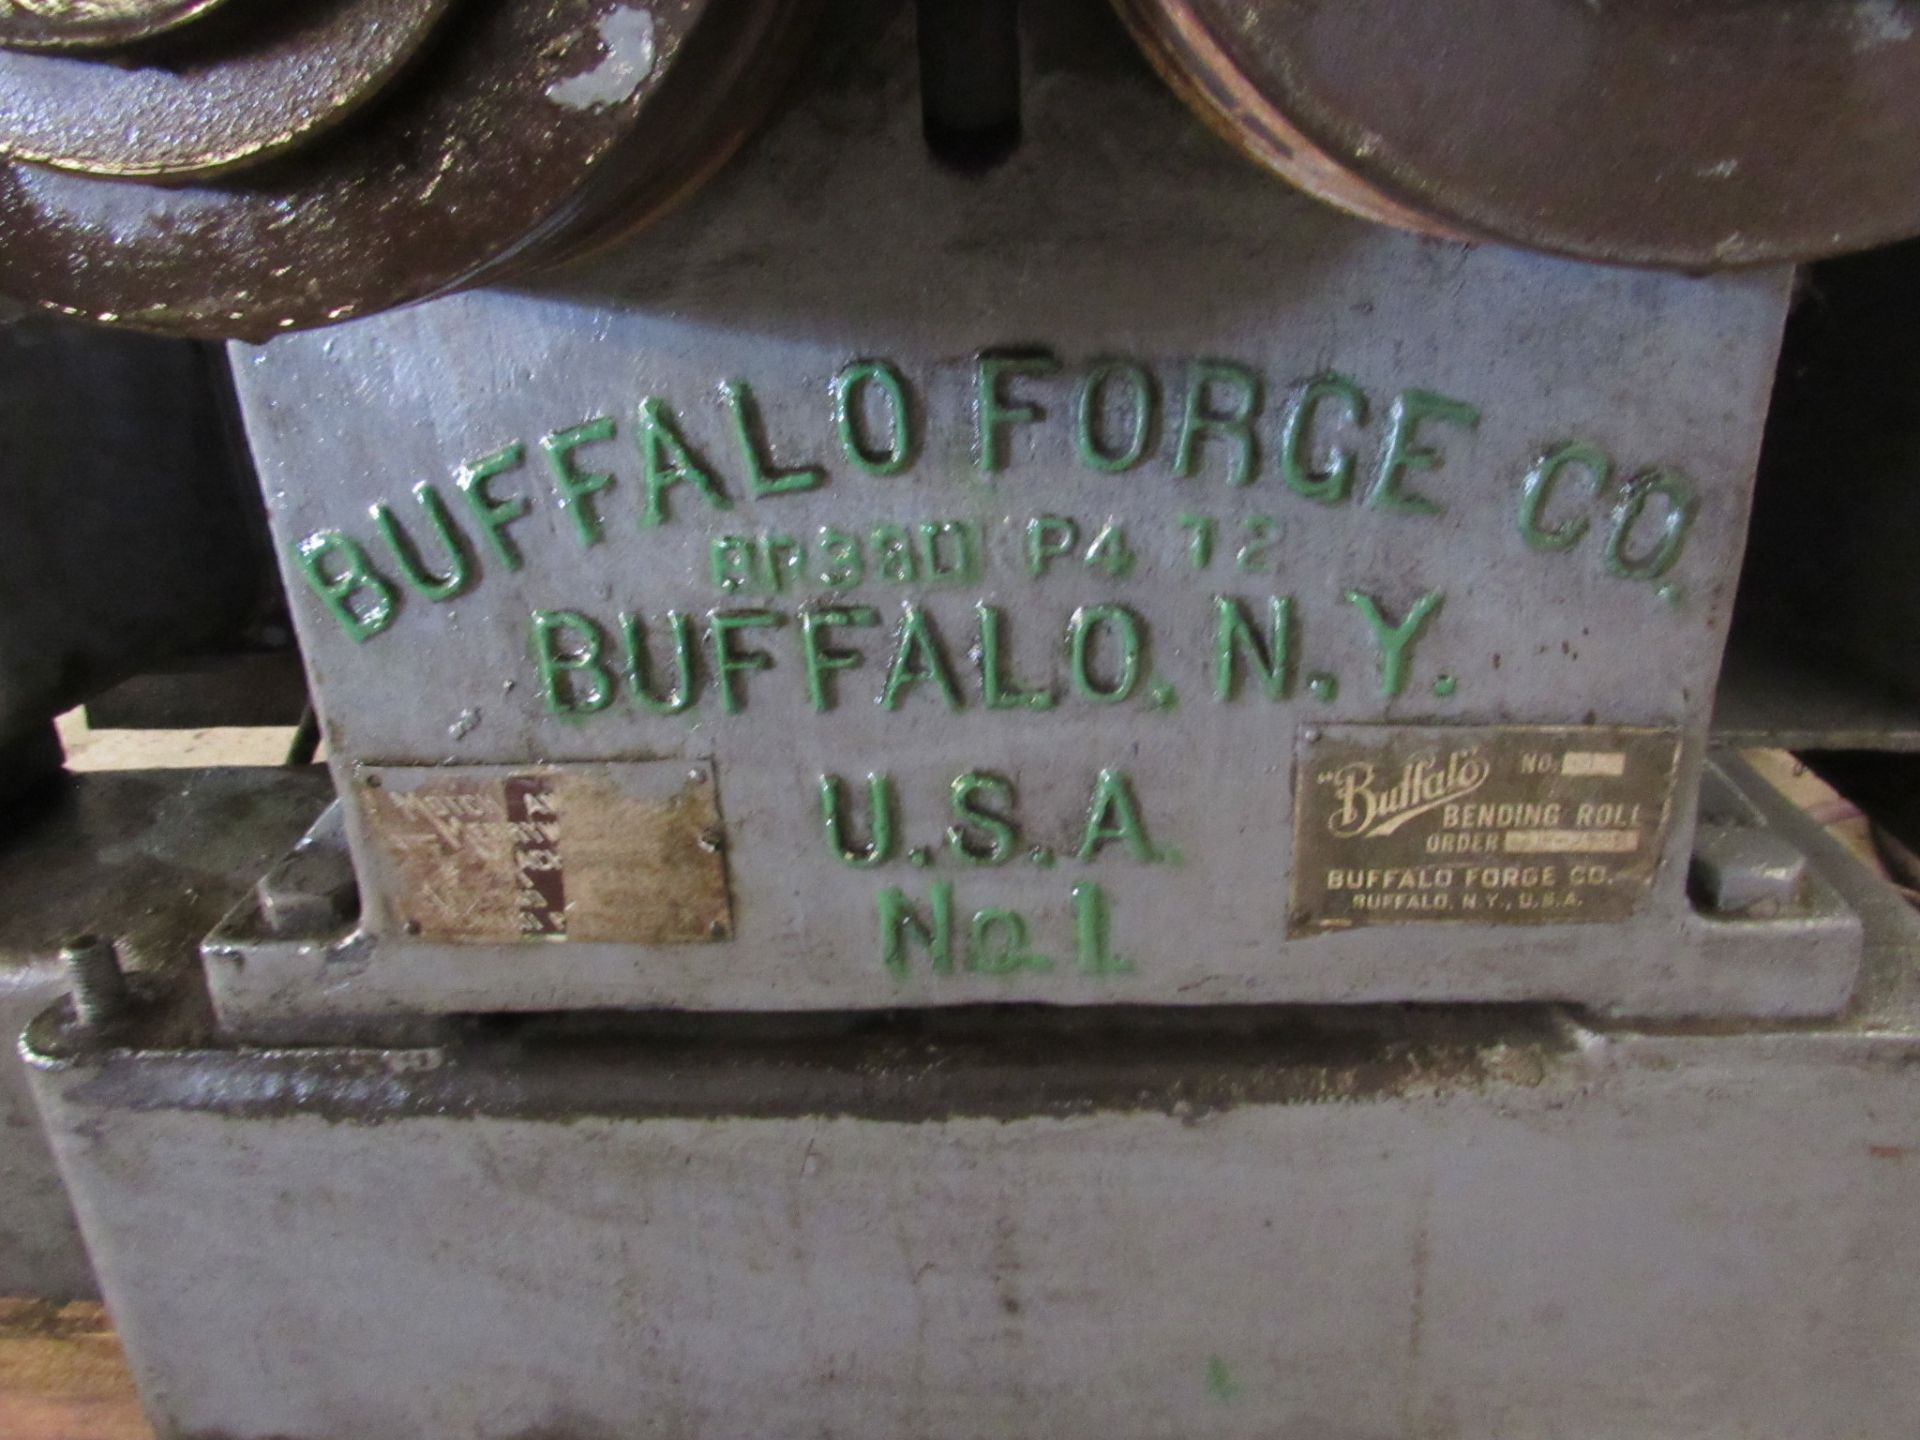 Buffalo No. 1 Angle Rolls - Image 4 of 4